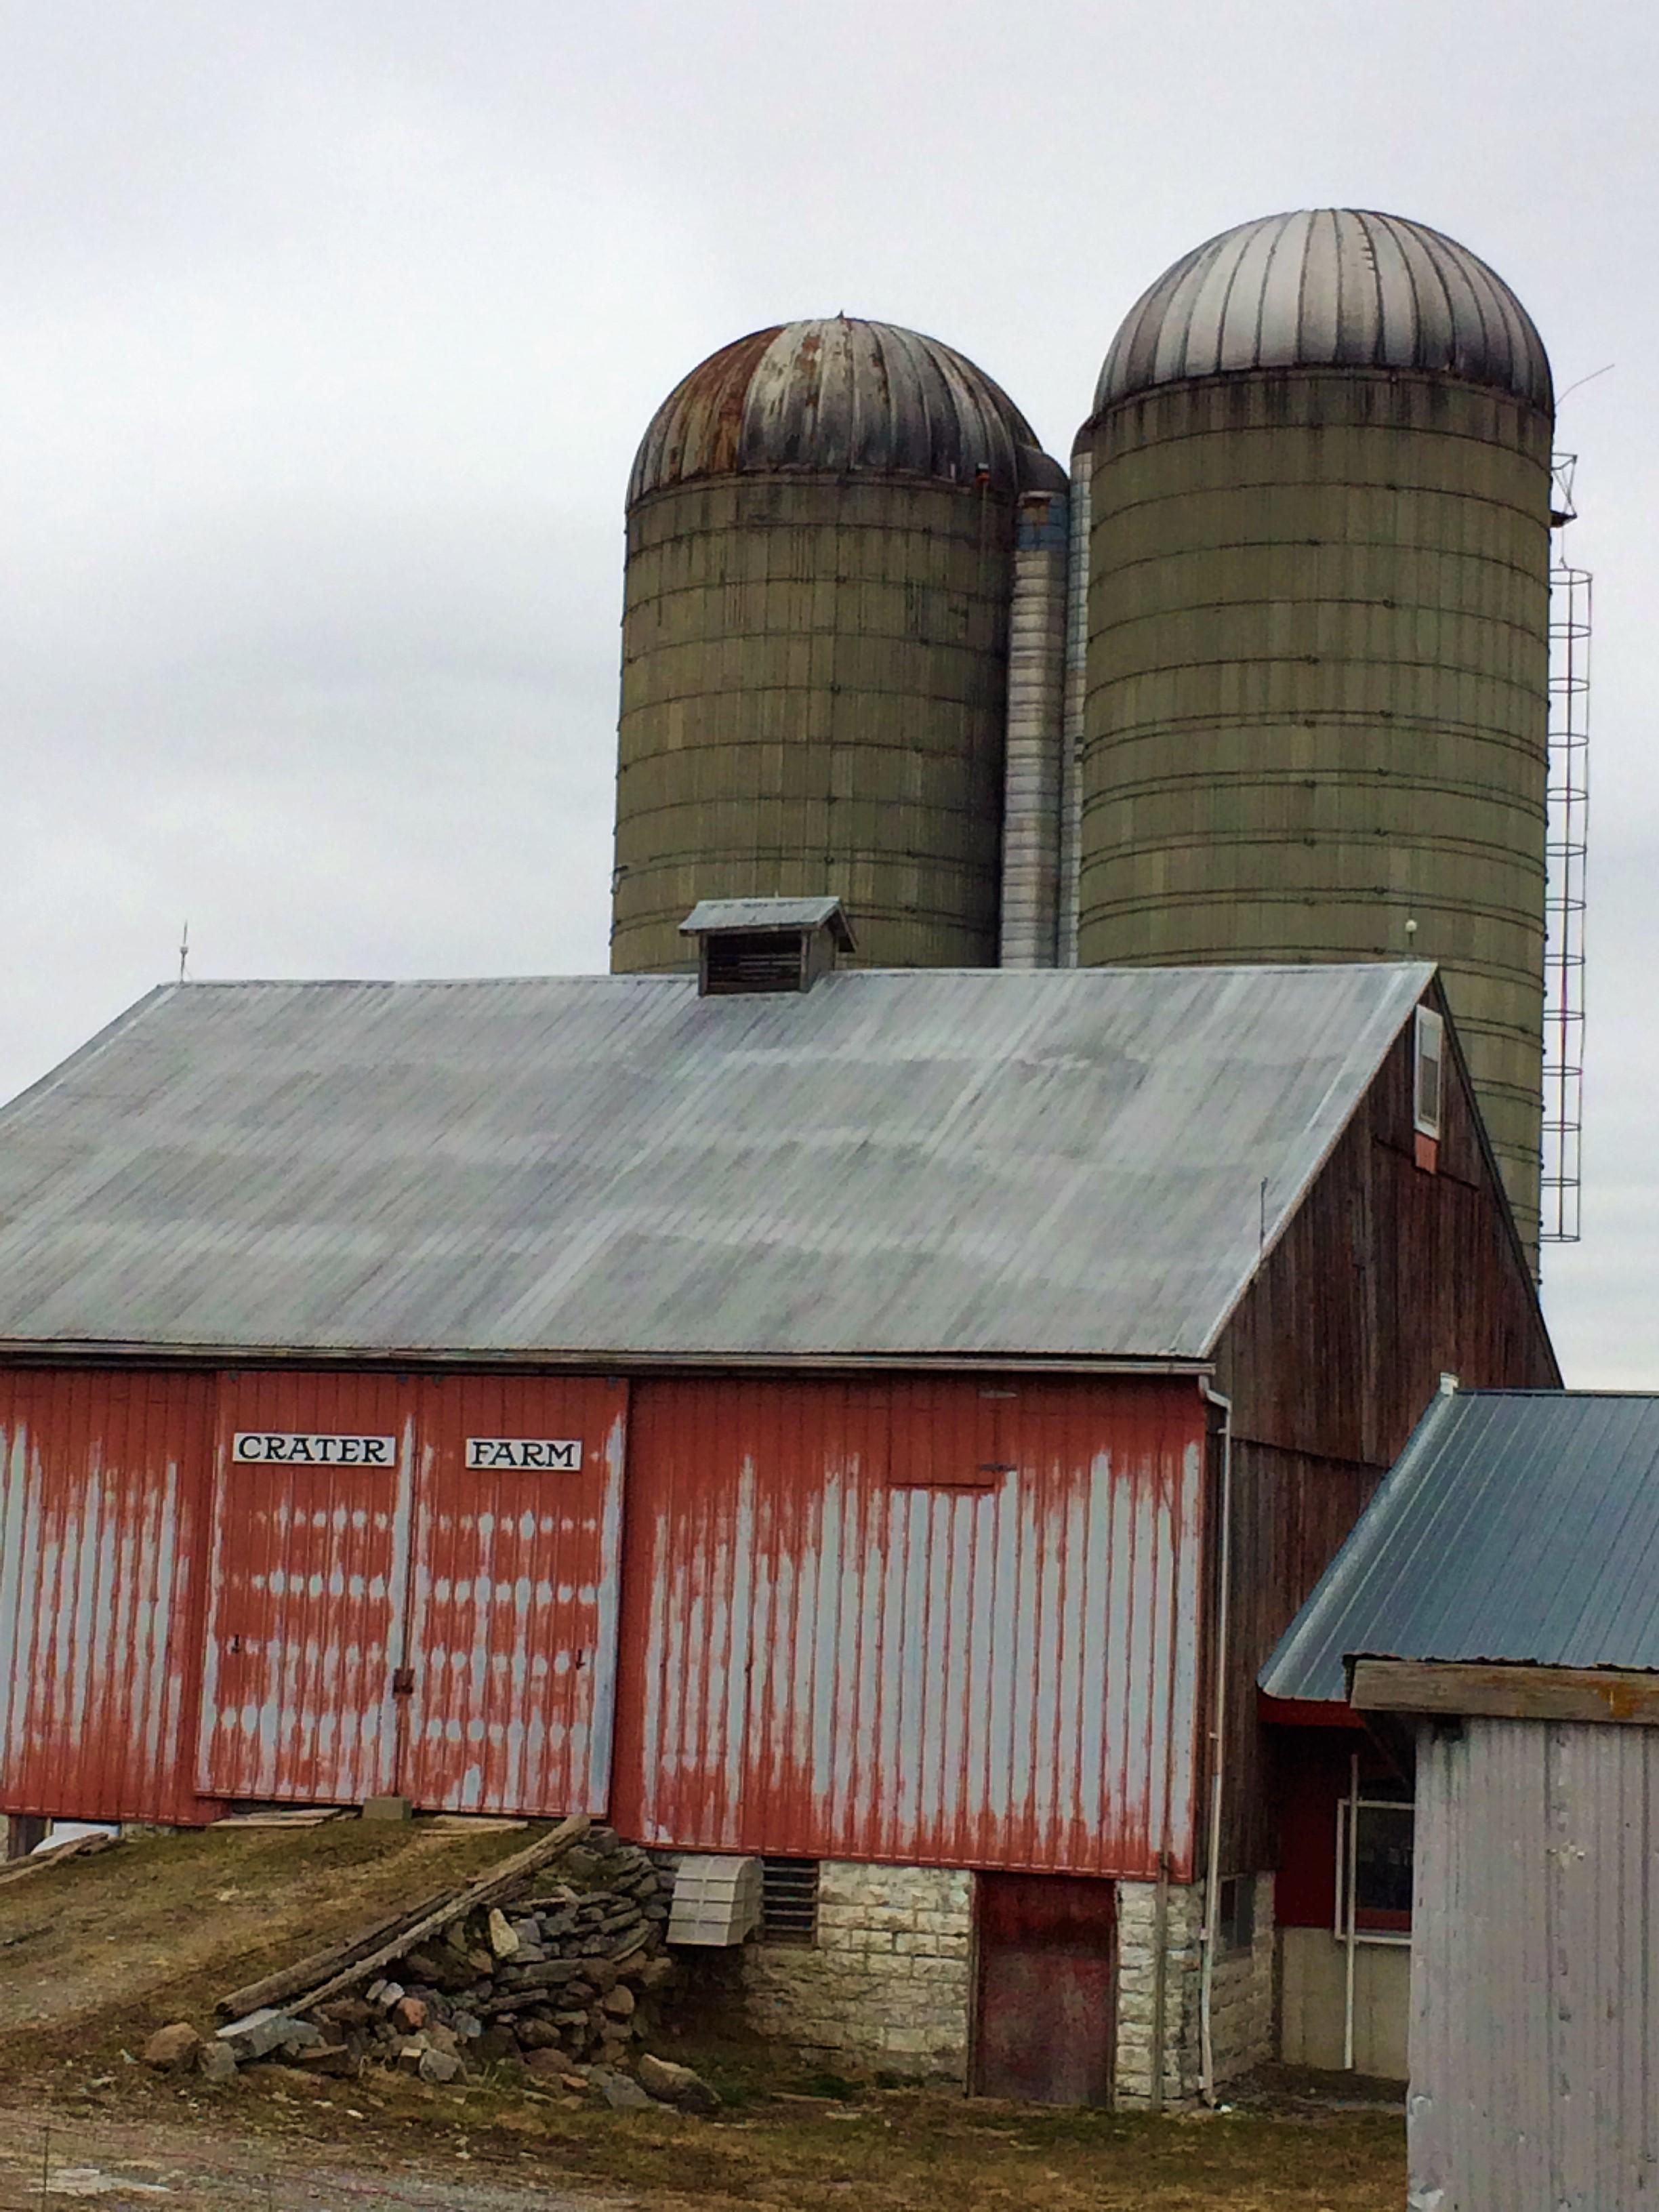 Holleford_Ontario_3._Crater_Farm